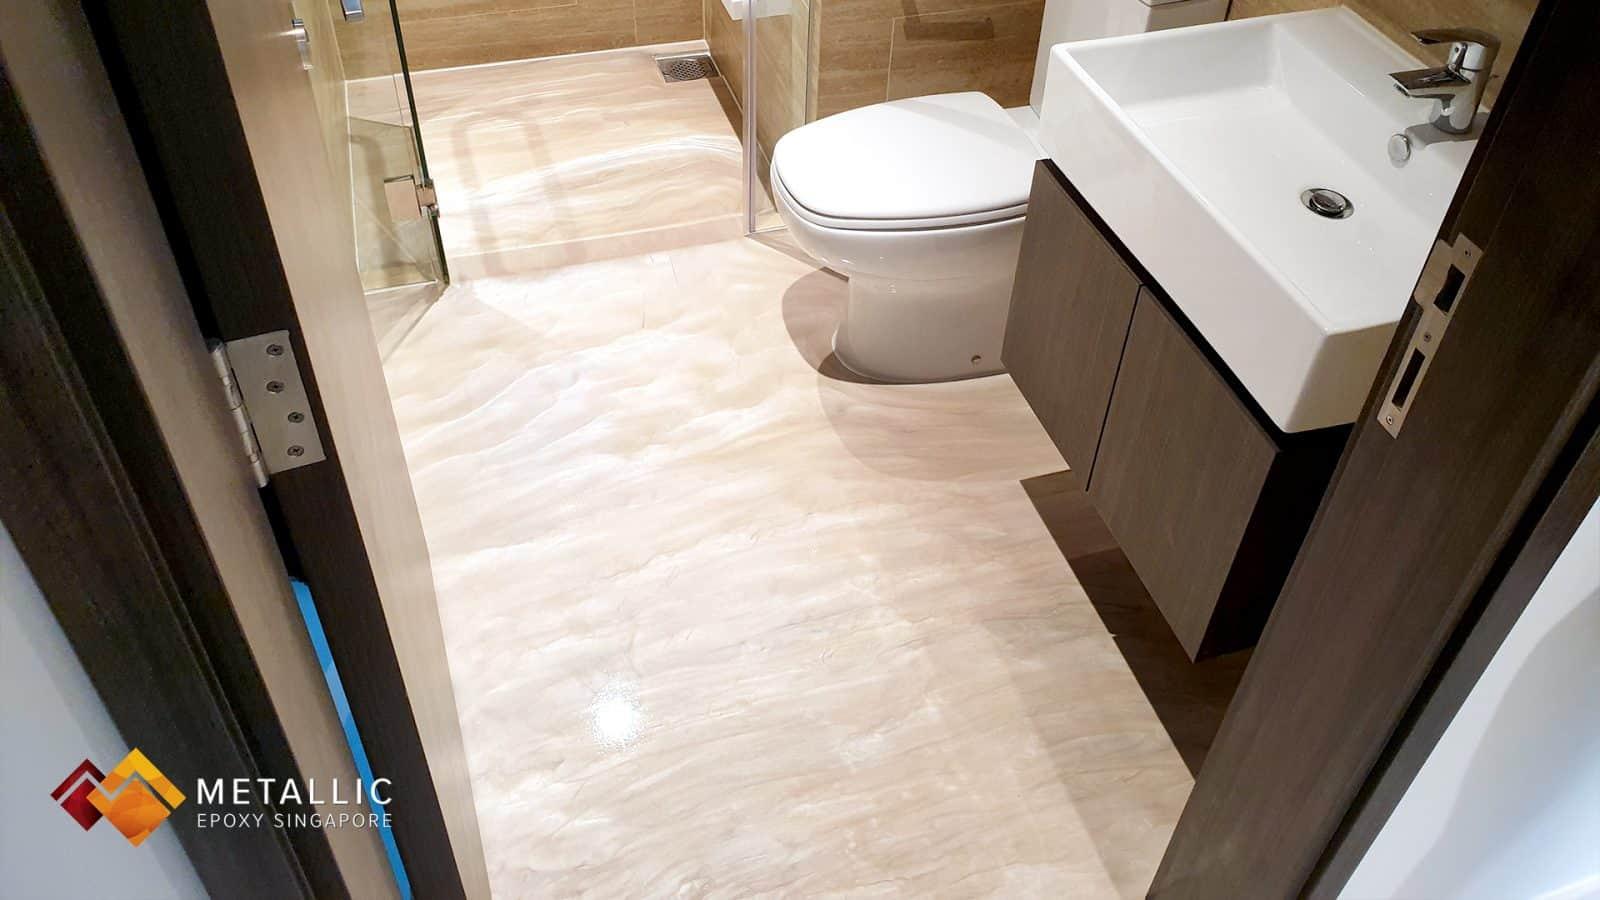 Metallic Epoxy Light Brown Wood Bathroom Floor